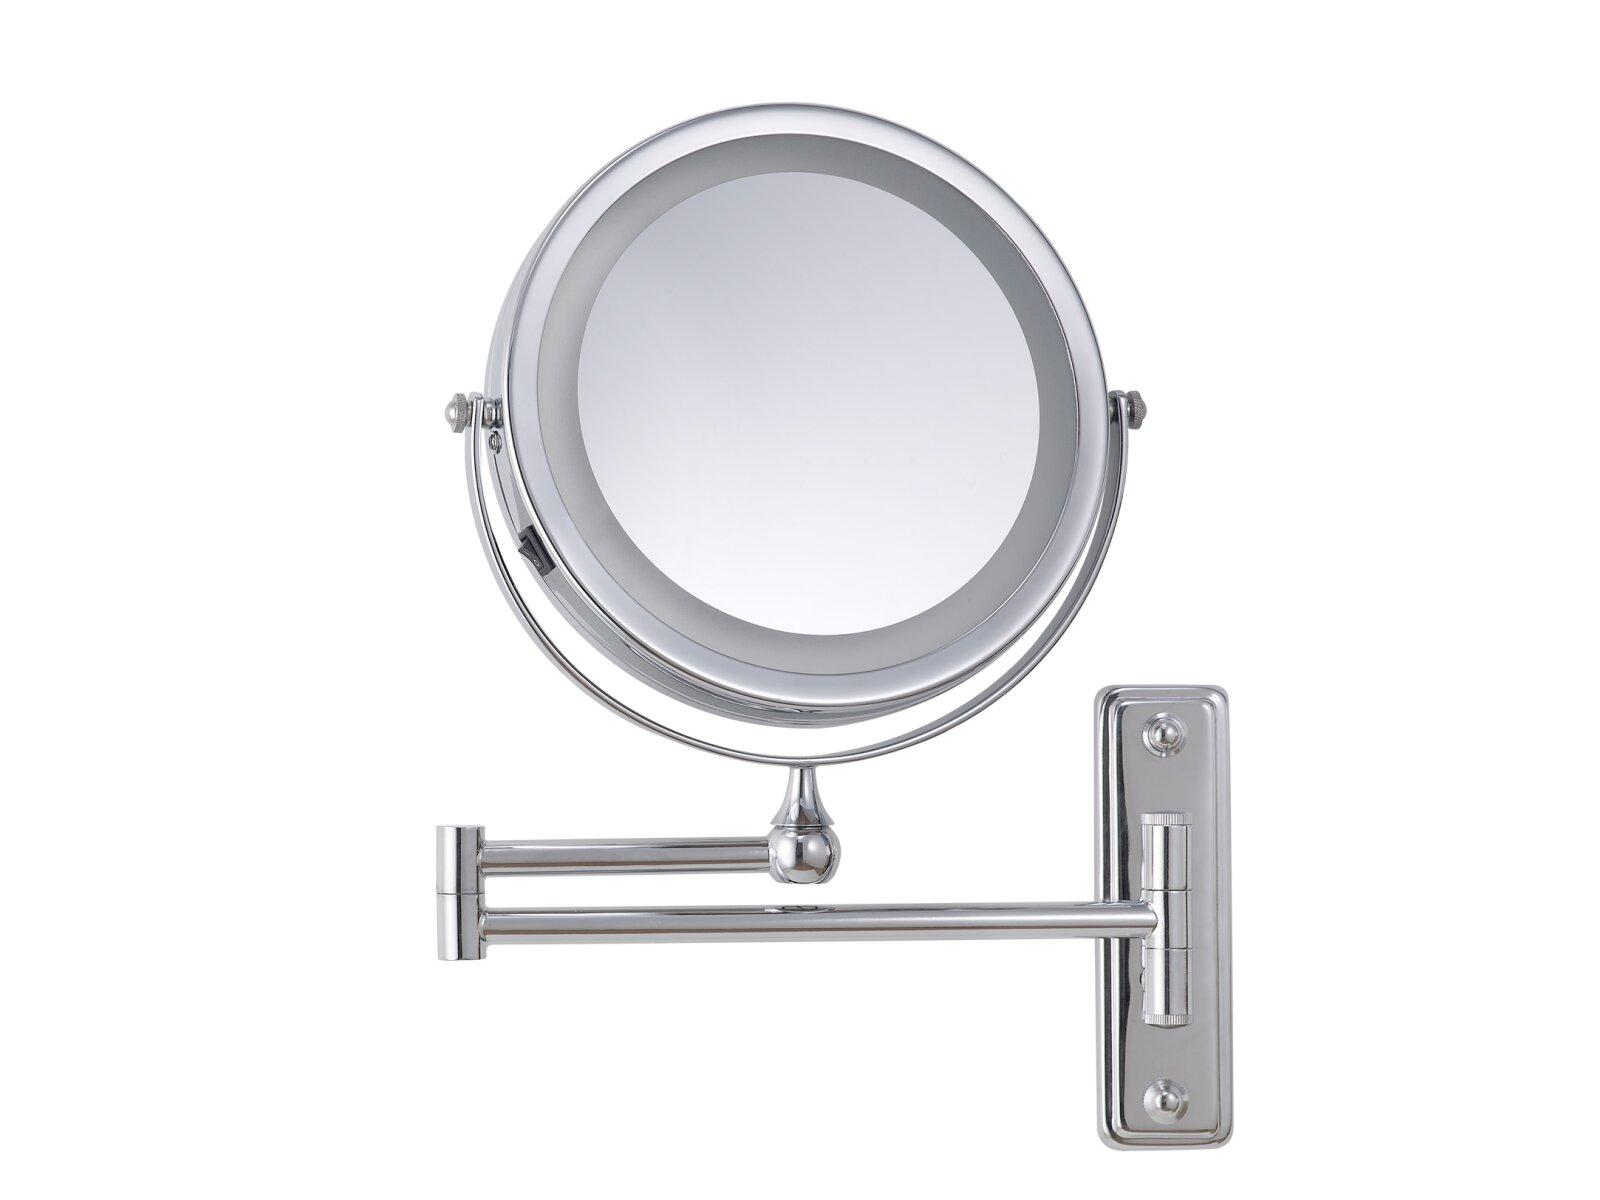 beleuchteter kosmetikspiegel wandmontiert corby. Black Bedroom Furniture Sets. Home Design Ideas